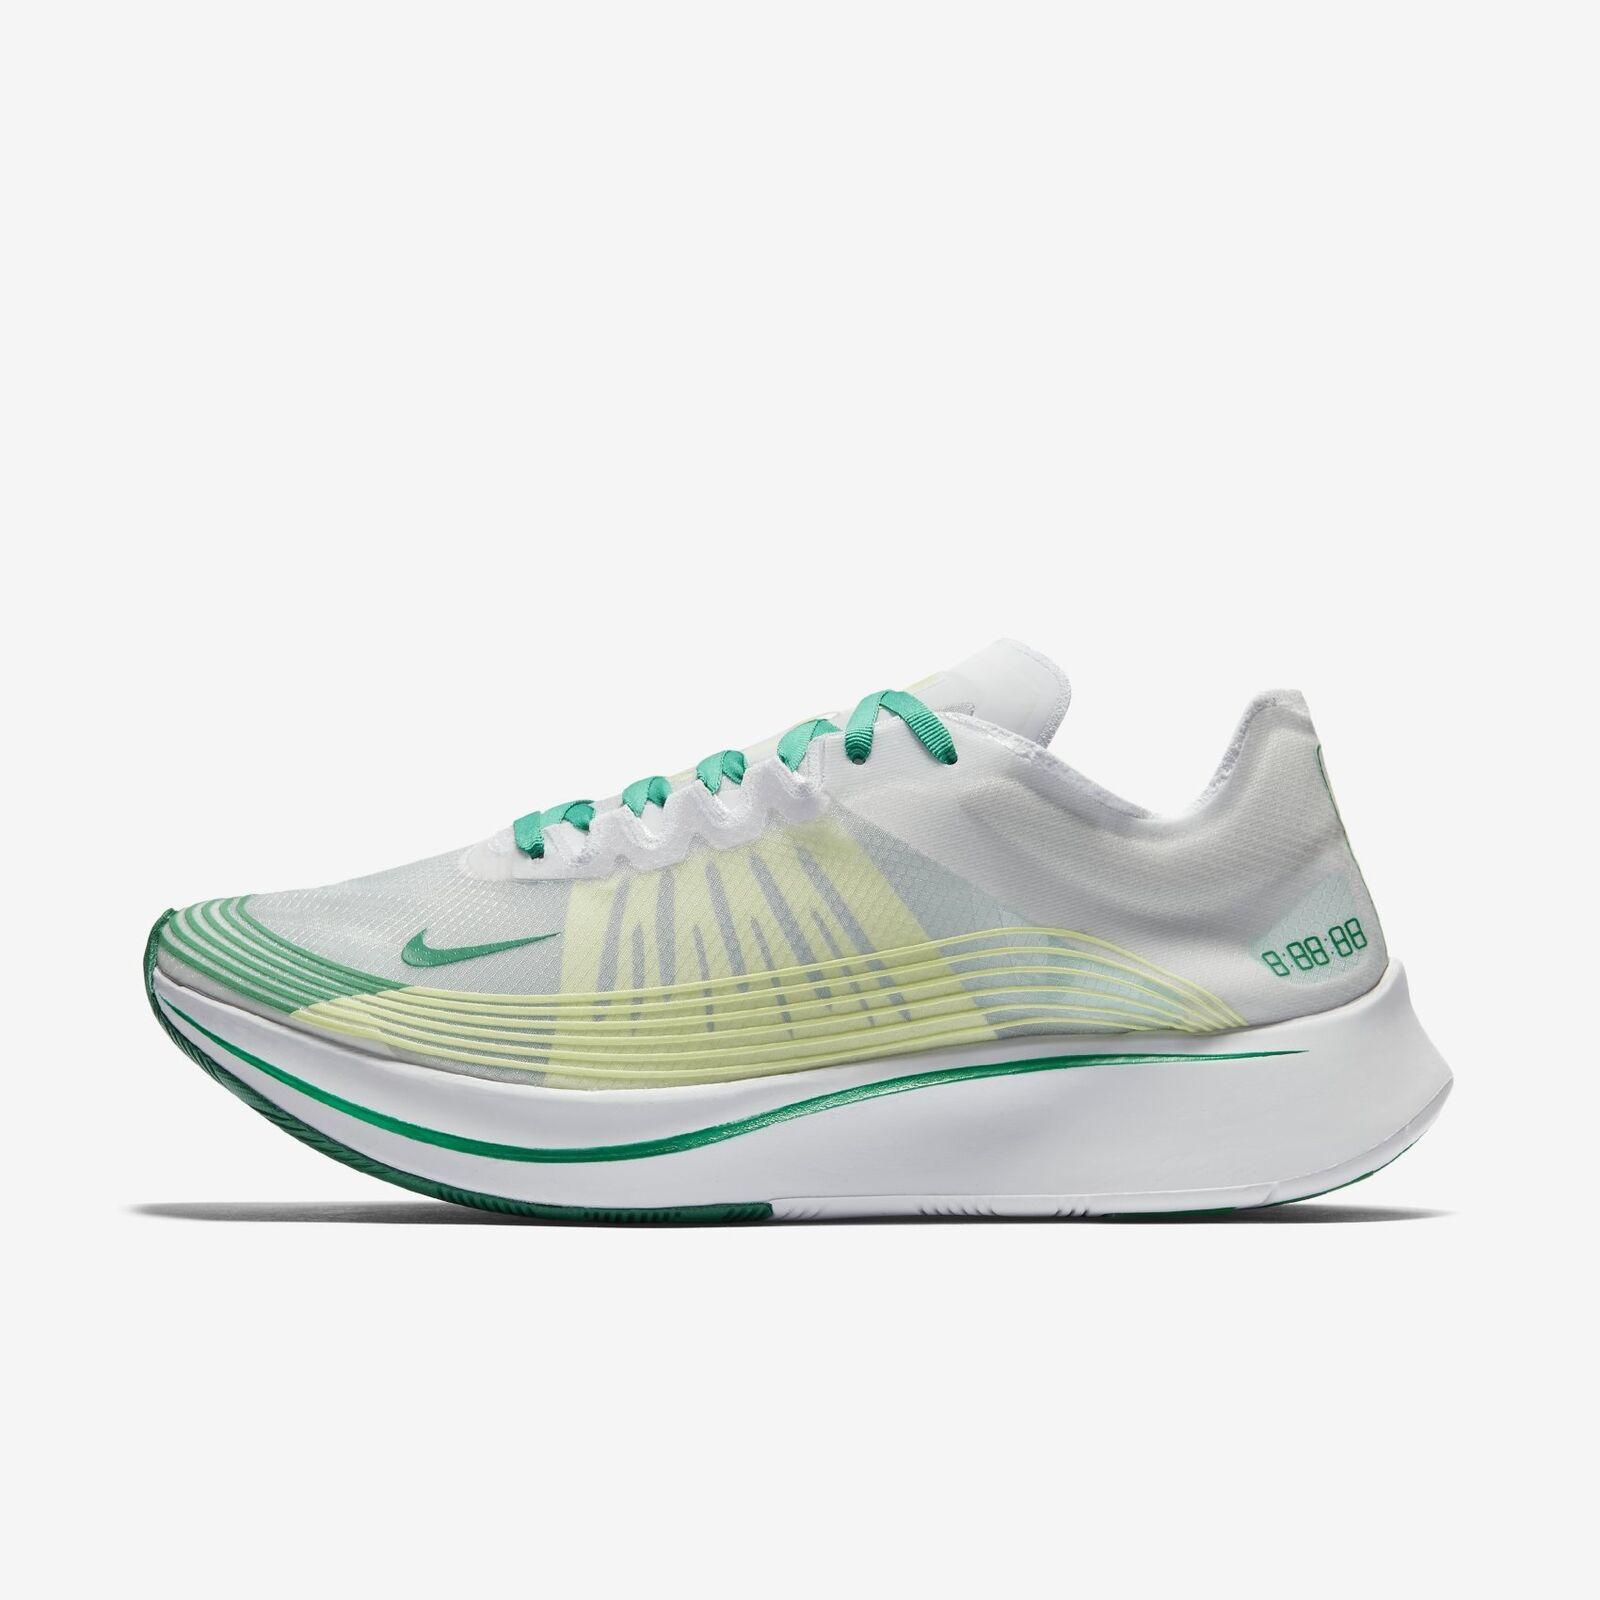 Men's NikeLab Zoom Fly Running shoes White Lucid Green Size 13 AJ9282 101 NIB